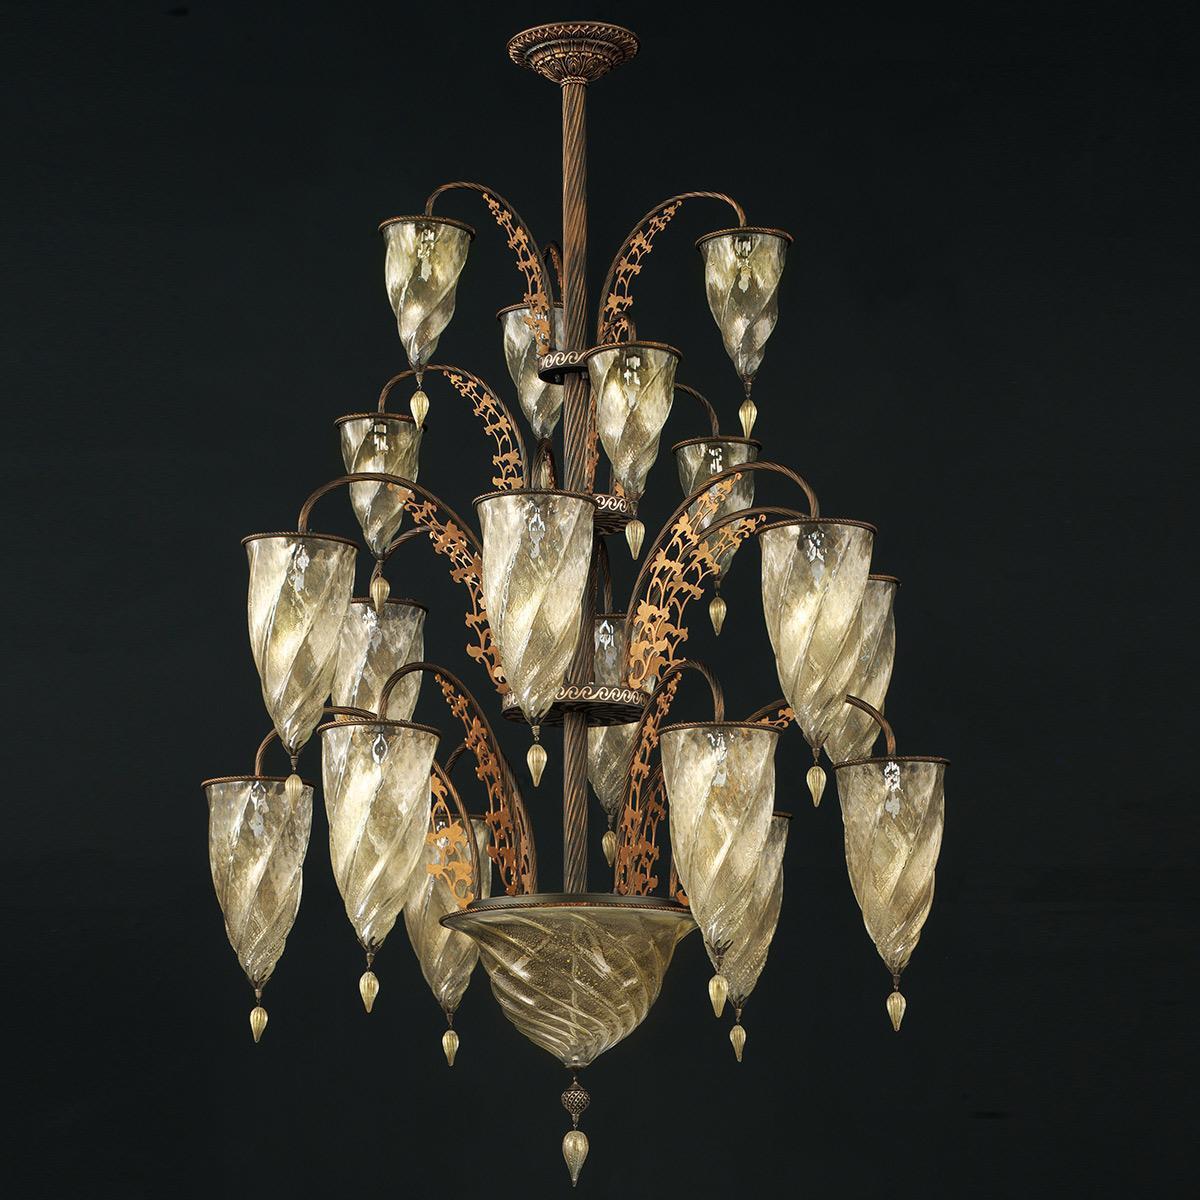 """Alessandria"" lampara de araña de Murano - 19 luce - oro"